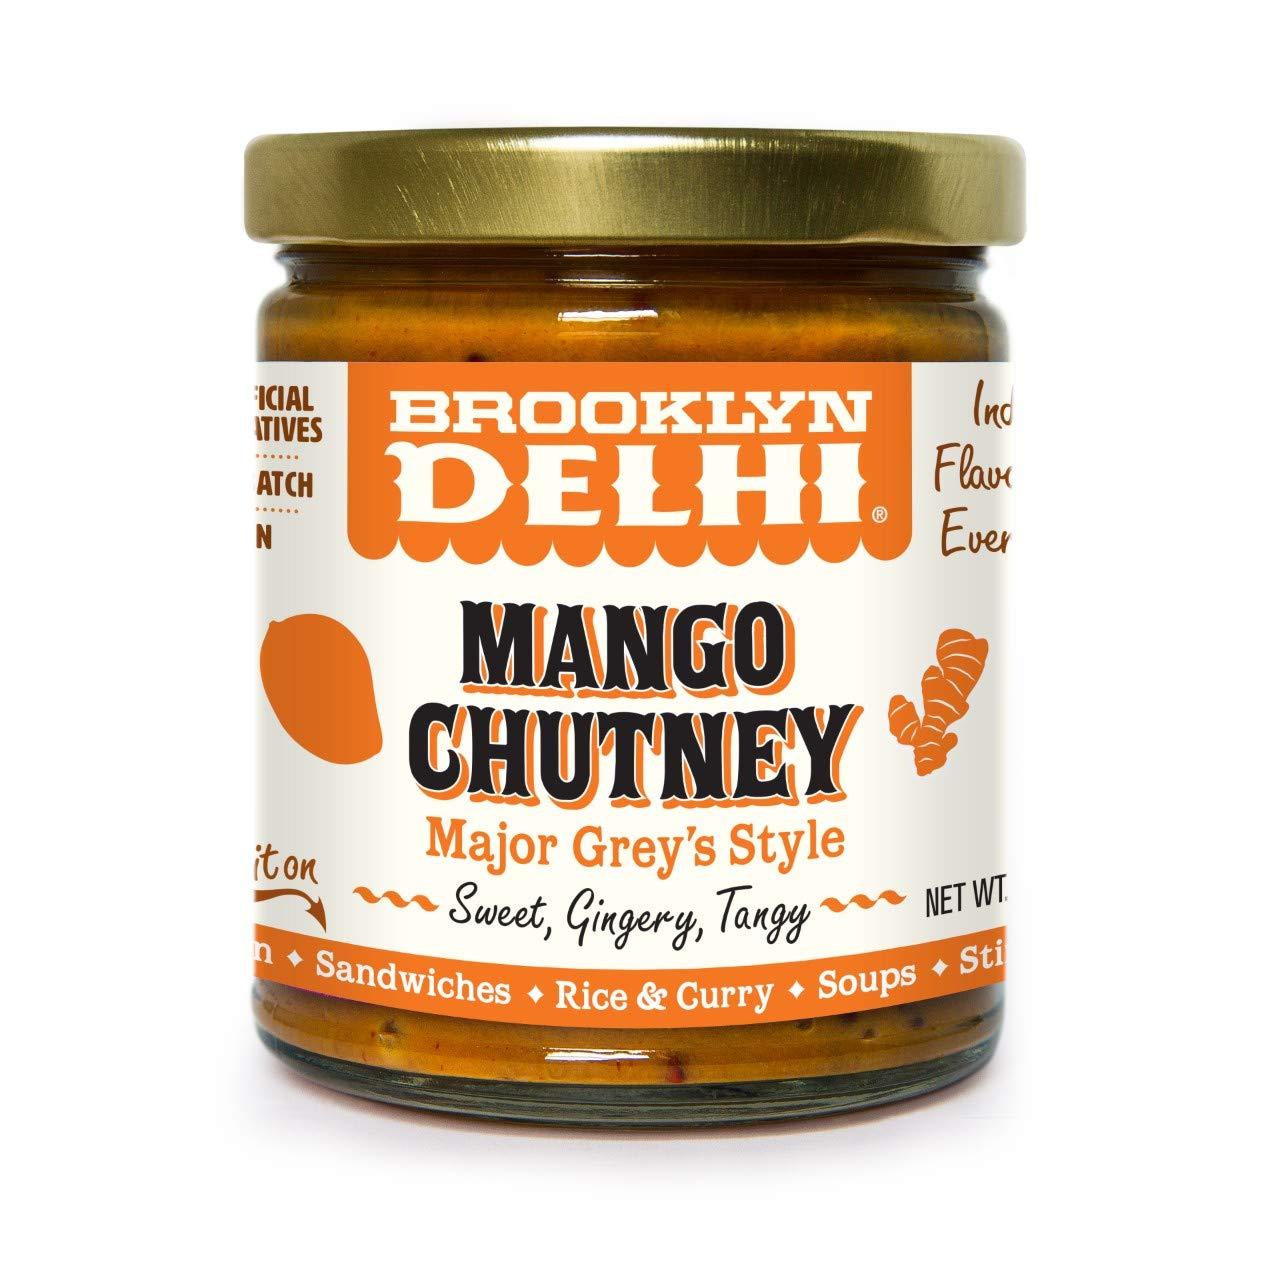 Brooklyn Delhi Mango Chutney, Major Grey Style Sweet, Gingery, Tangy, 9 Oz